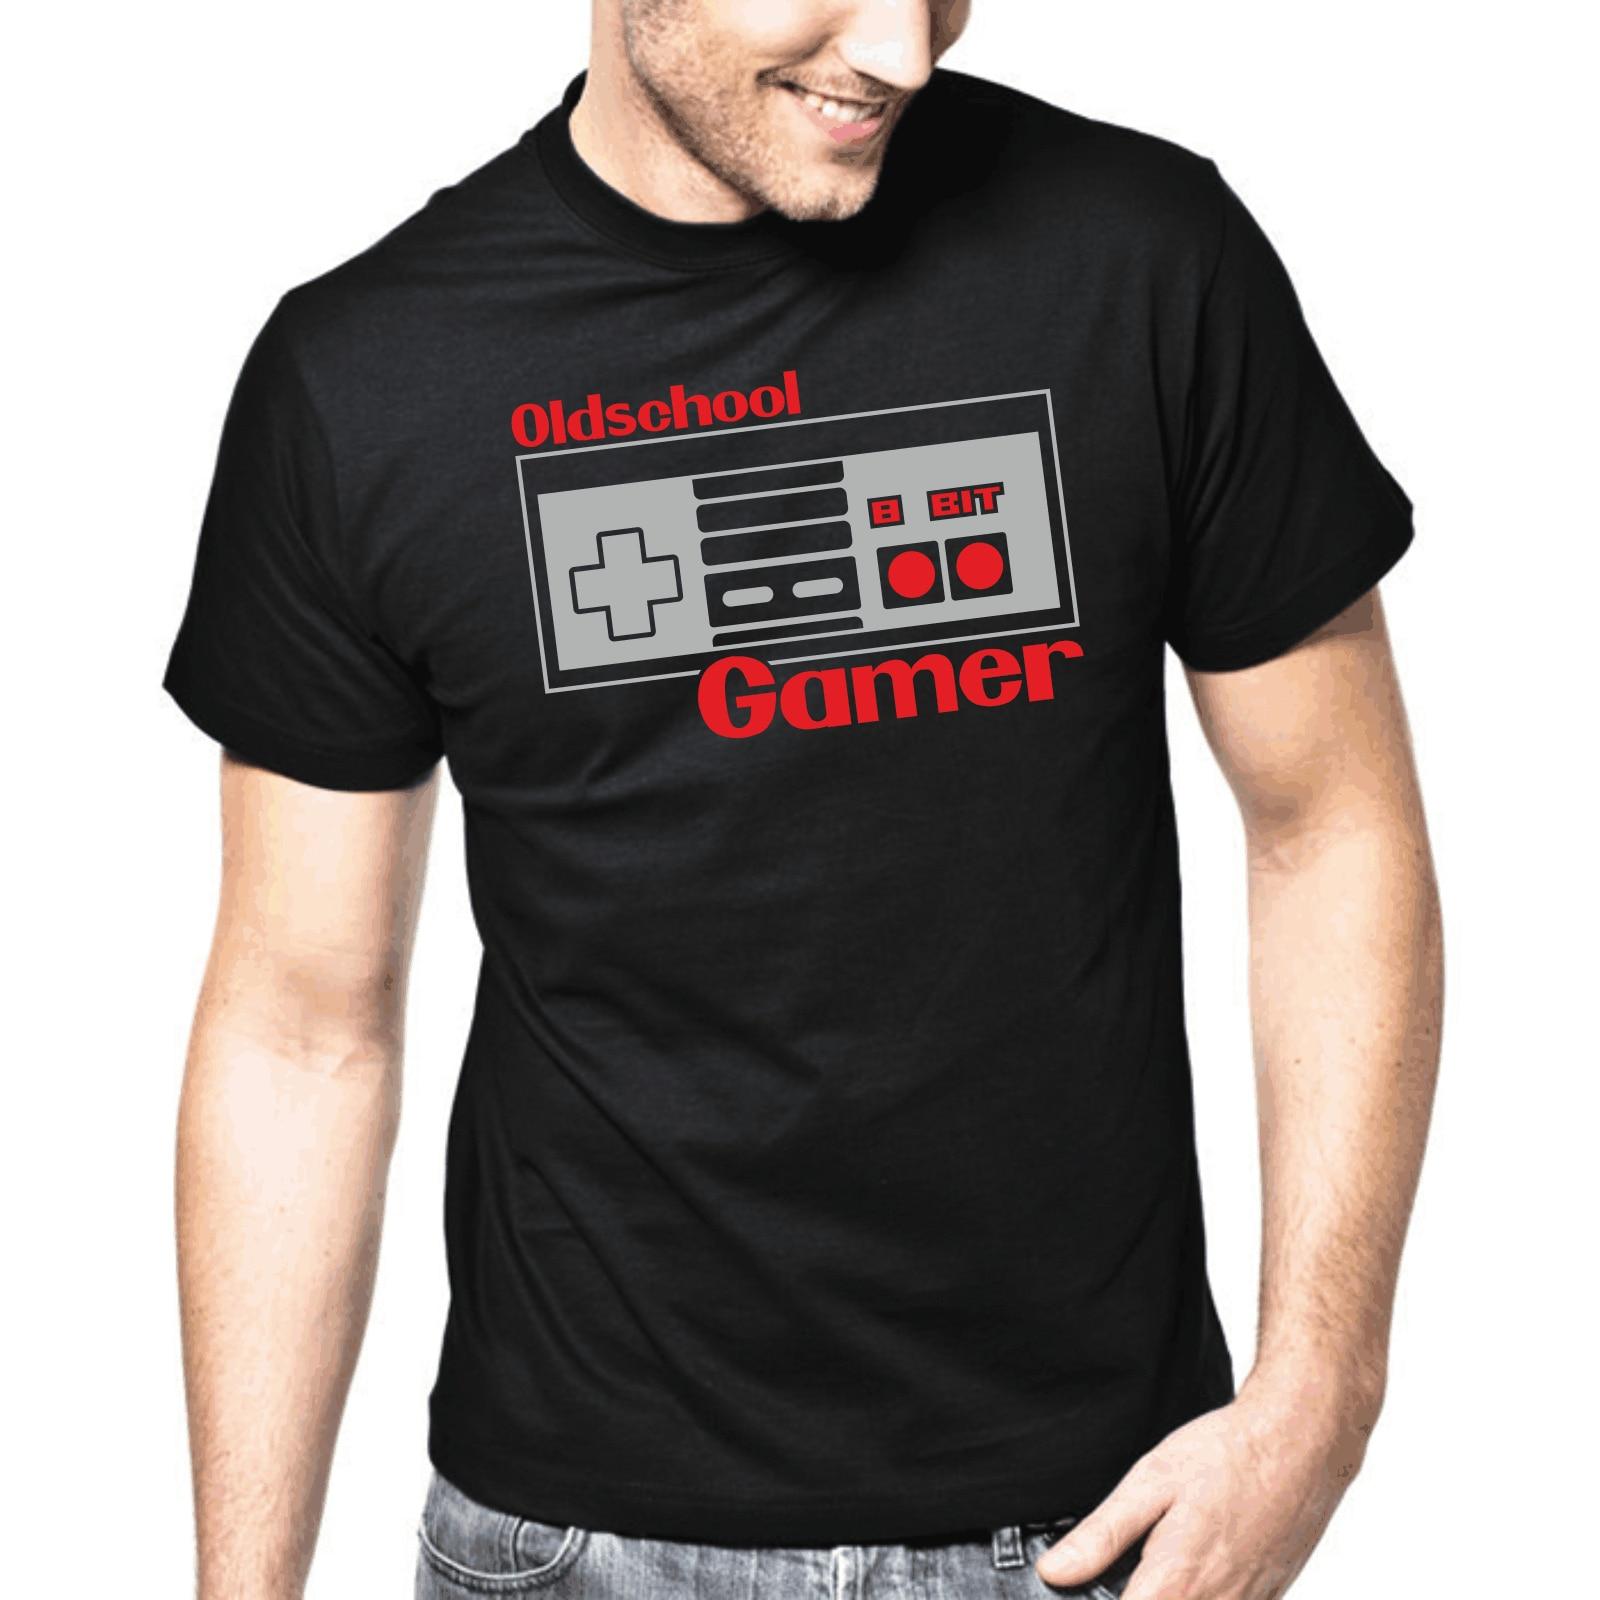 Oldschool Gamer  8 Bit  Retro  Nerd  Gamepad  Geek  Fun  S-XXL T-Shirt Fresh Design Summer Good Quality Funny Casual